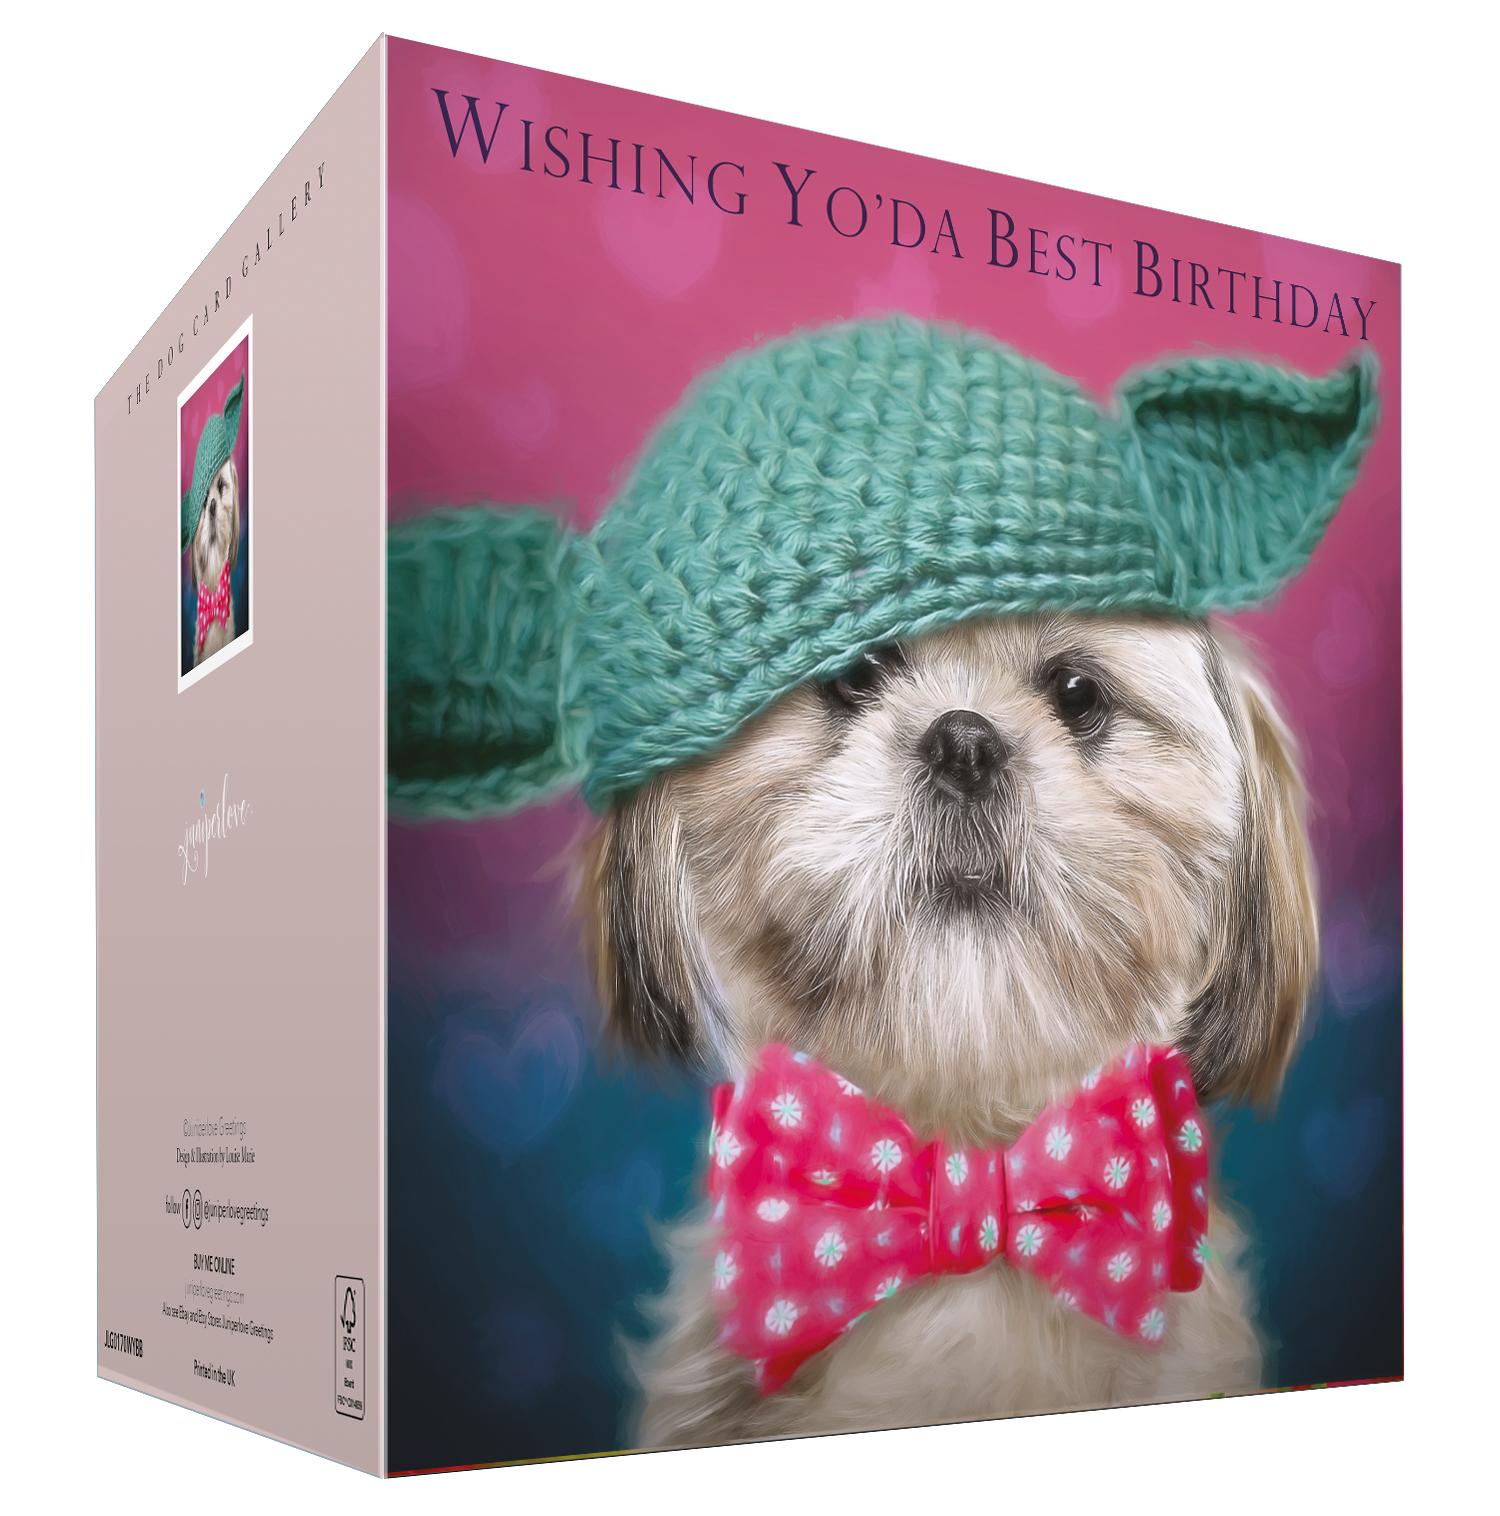 Shih-tzu birthday card